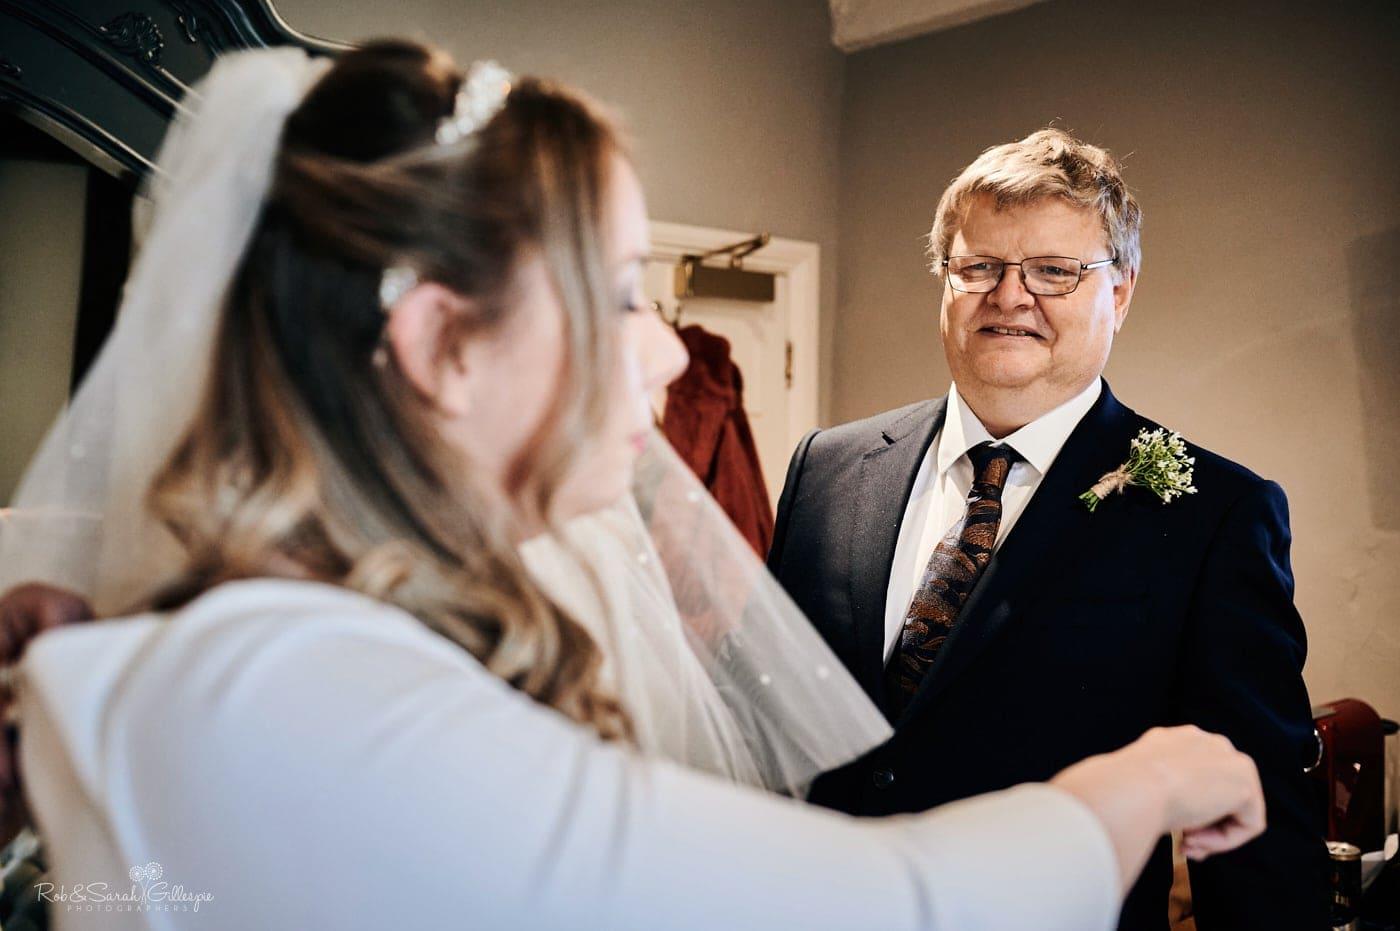 Bride's dad sees her in wedding dress